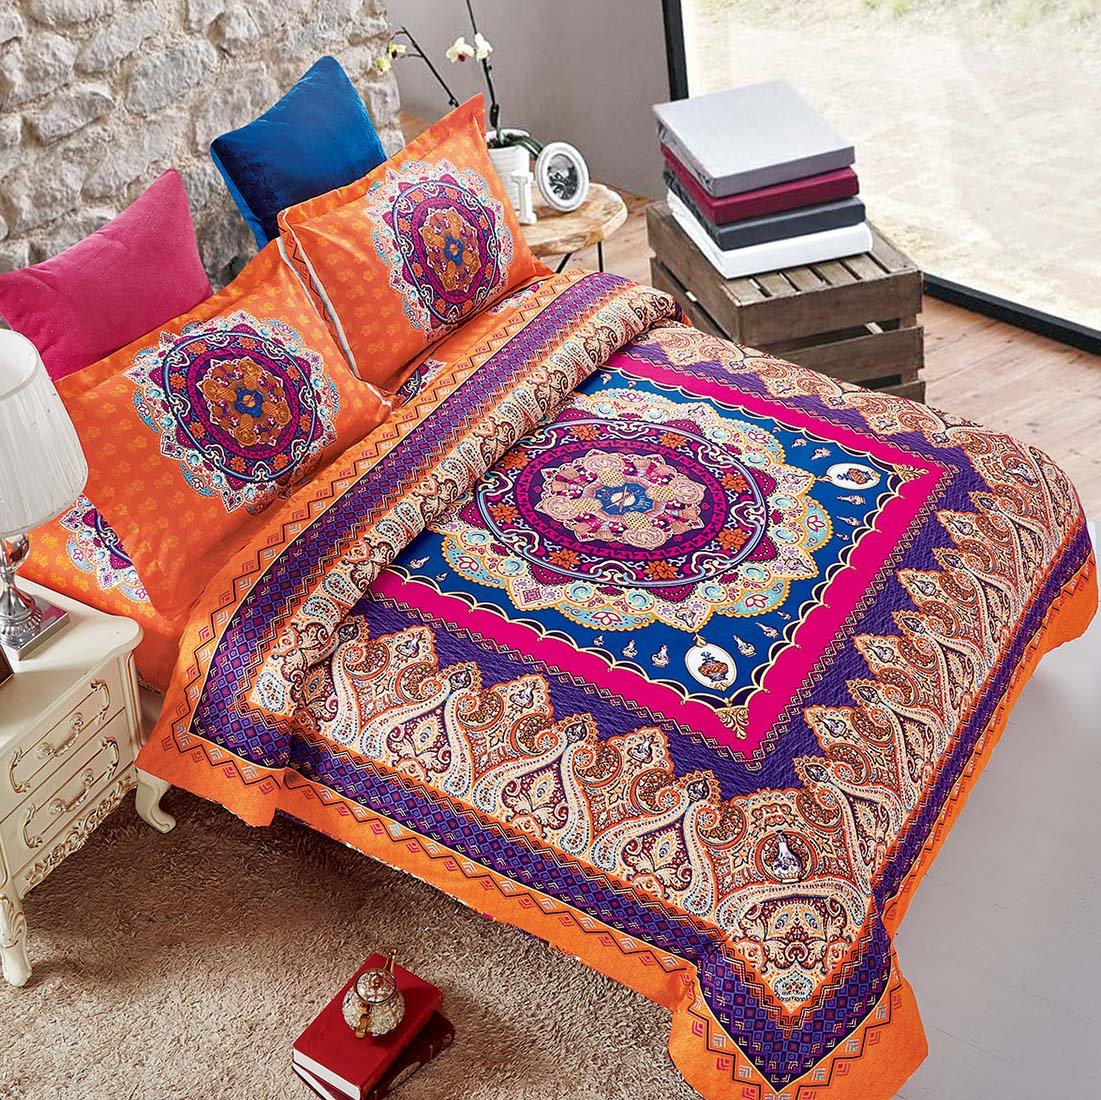 Wake In Cloud - Mandala Comforter Set Queen, 3-Piece Orange Bohemian Boho chic Medallion Pattern Printed, Soft Microfiber Bedding (3pcs, Queen Size)